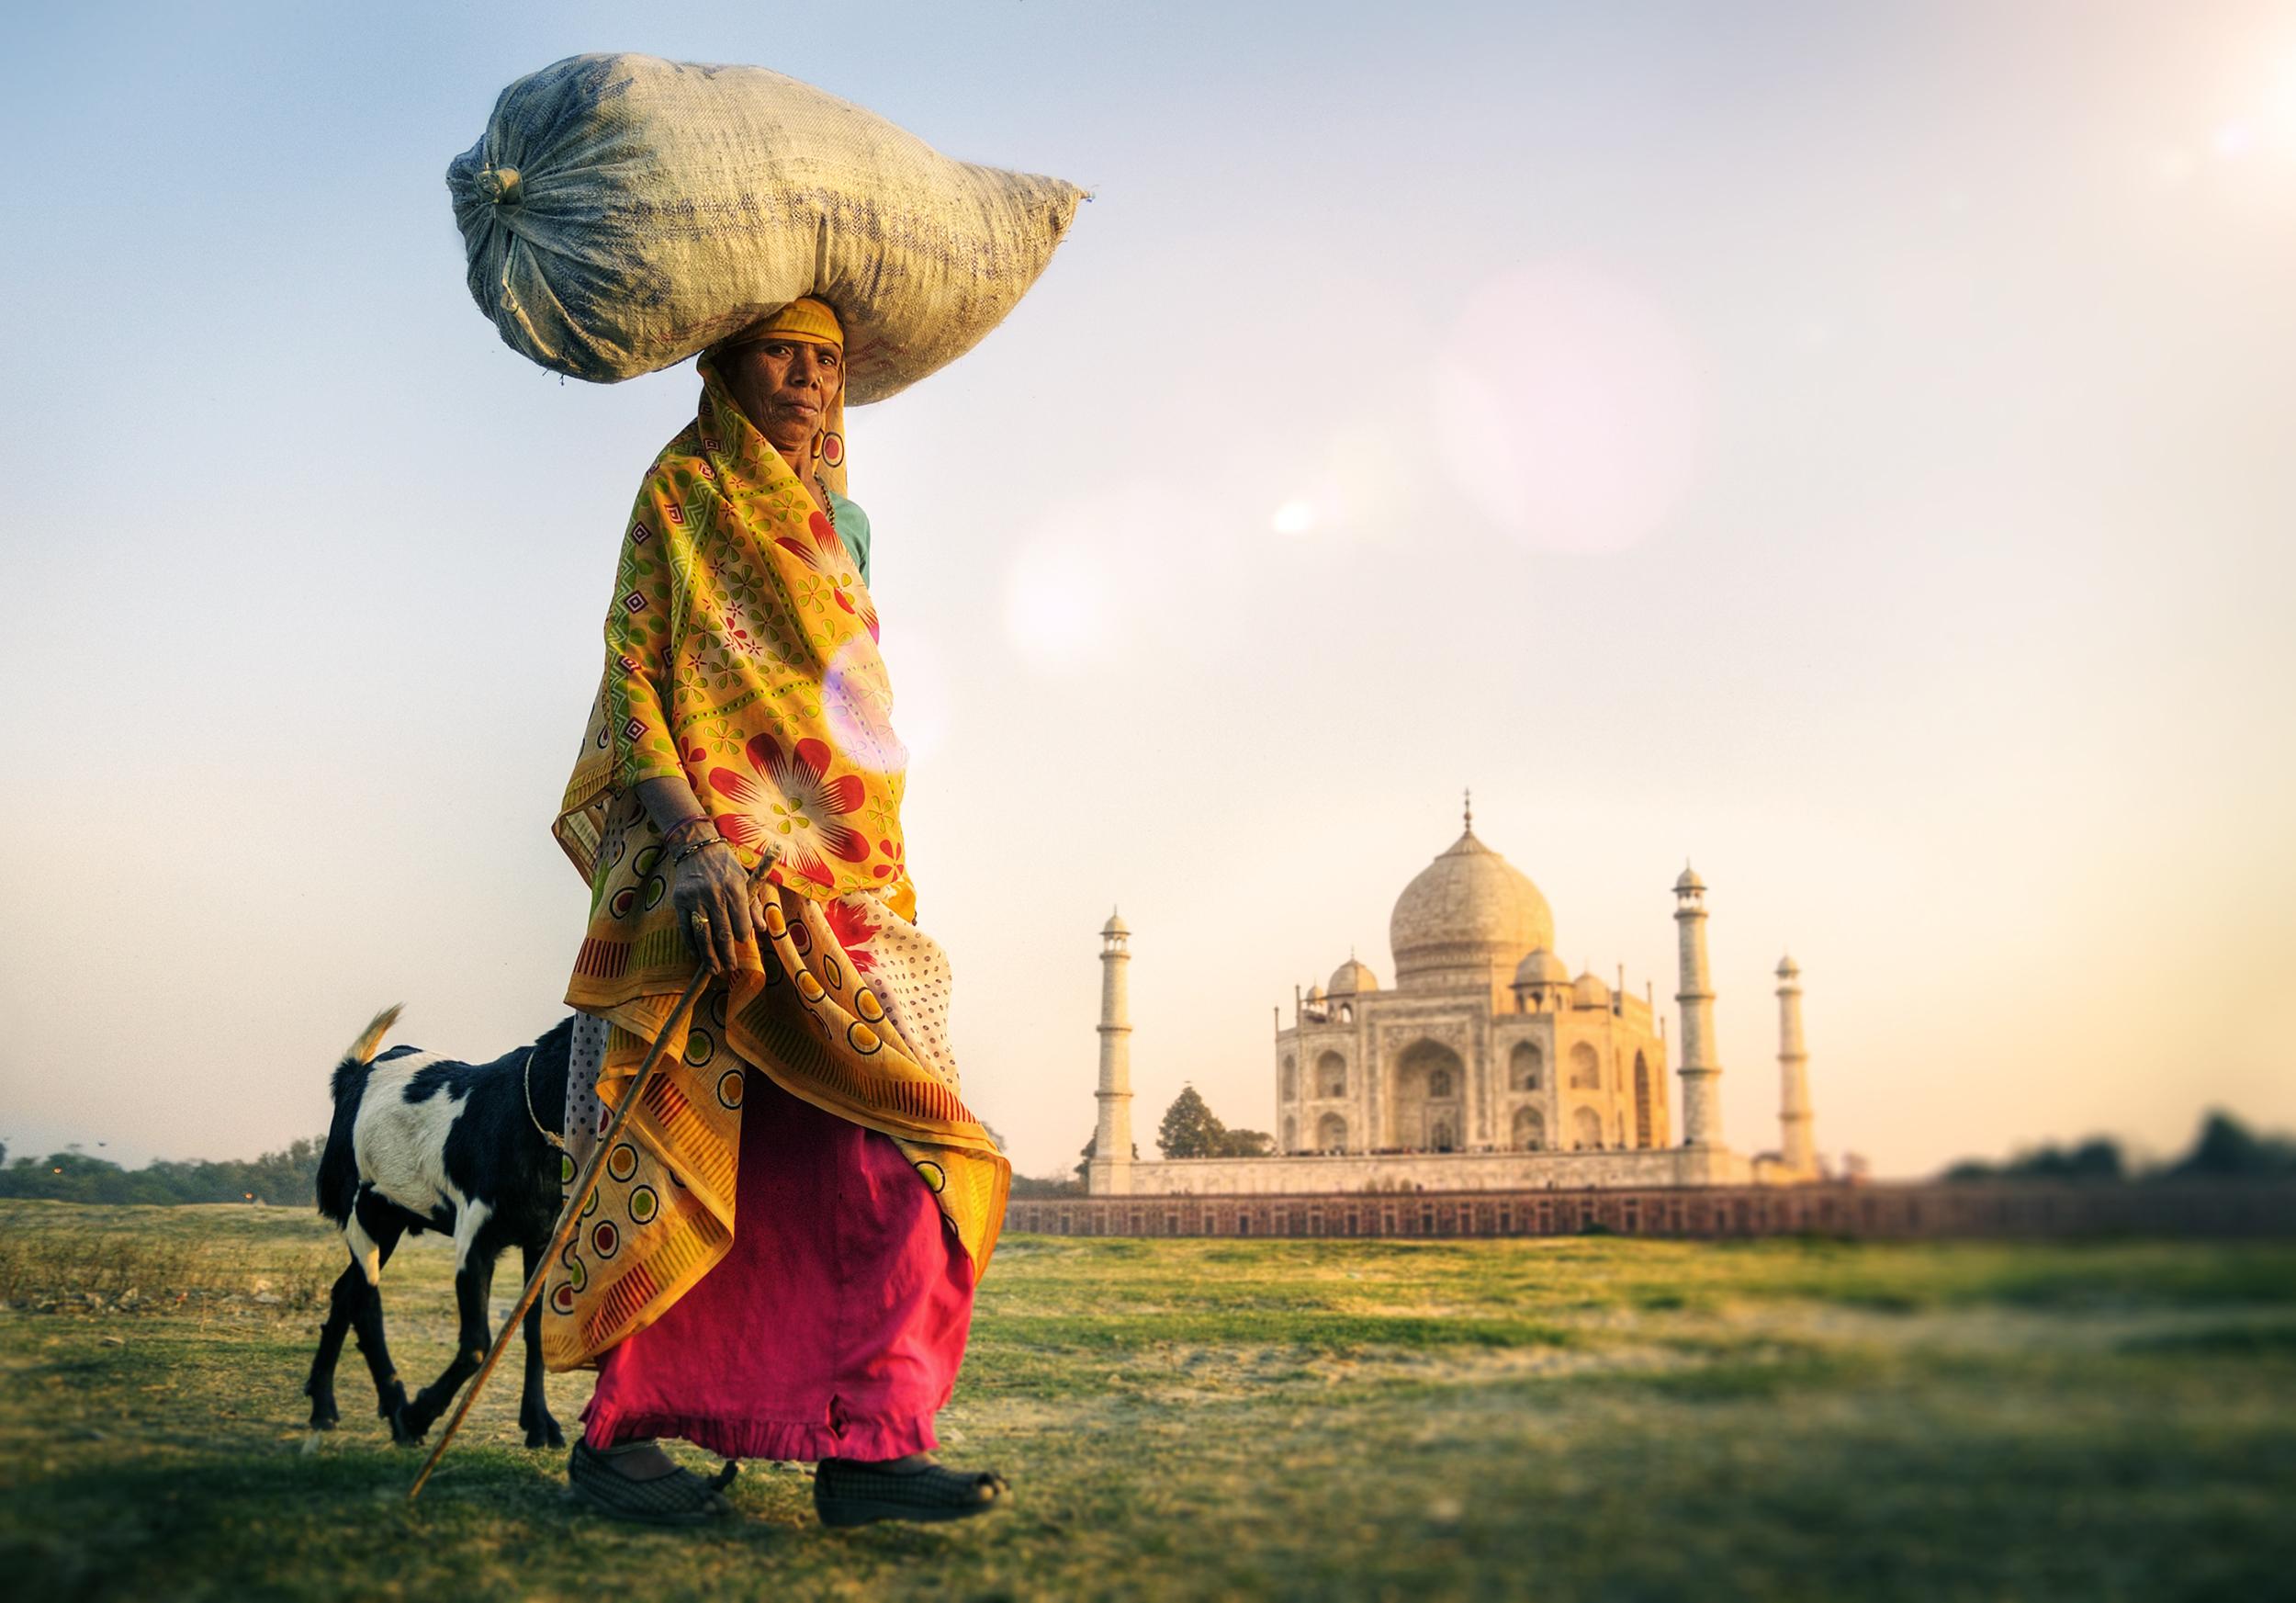 india_bigstock-Indian-Woman-Carrying-on-Head--104824811.jpg